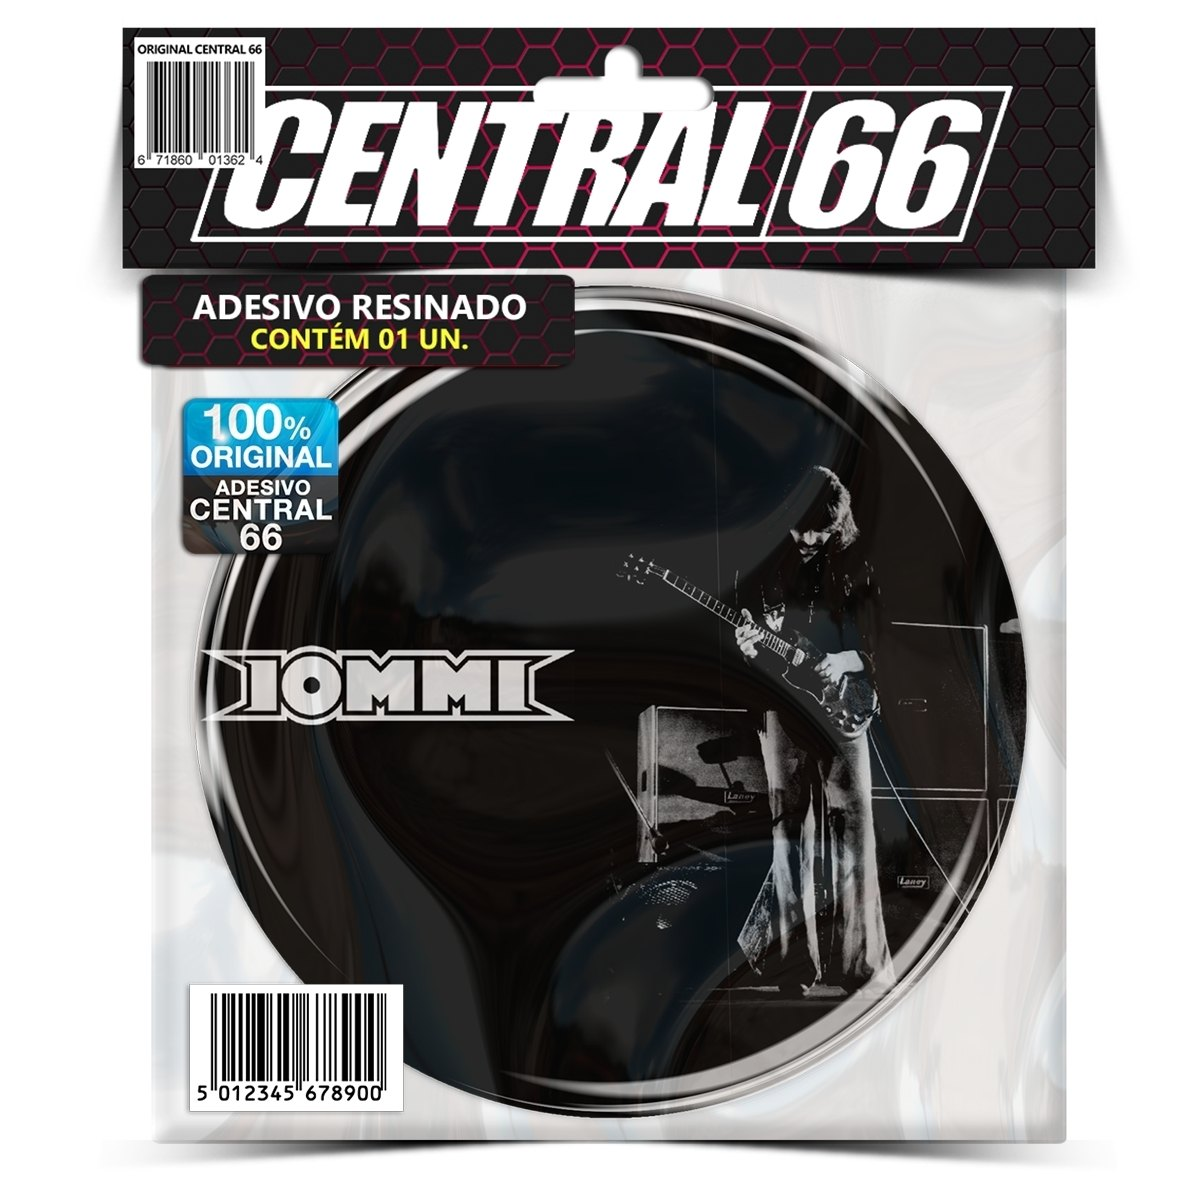 Adesivo Redondo Black Sababth Iommy – Central 66